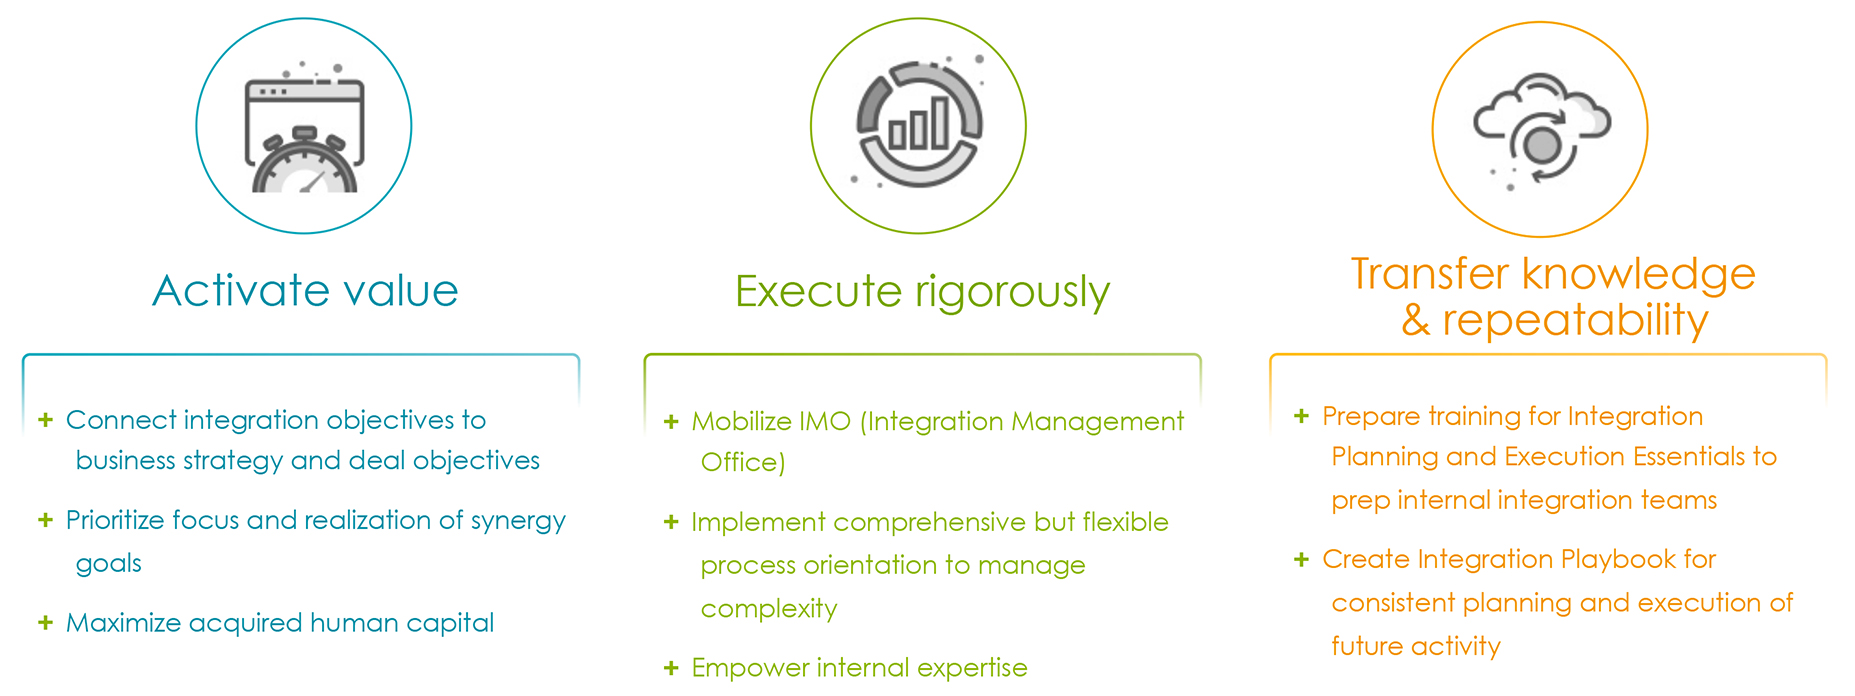 global pmi partners strategy